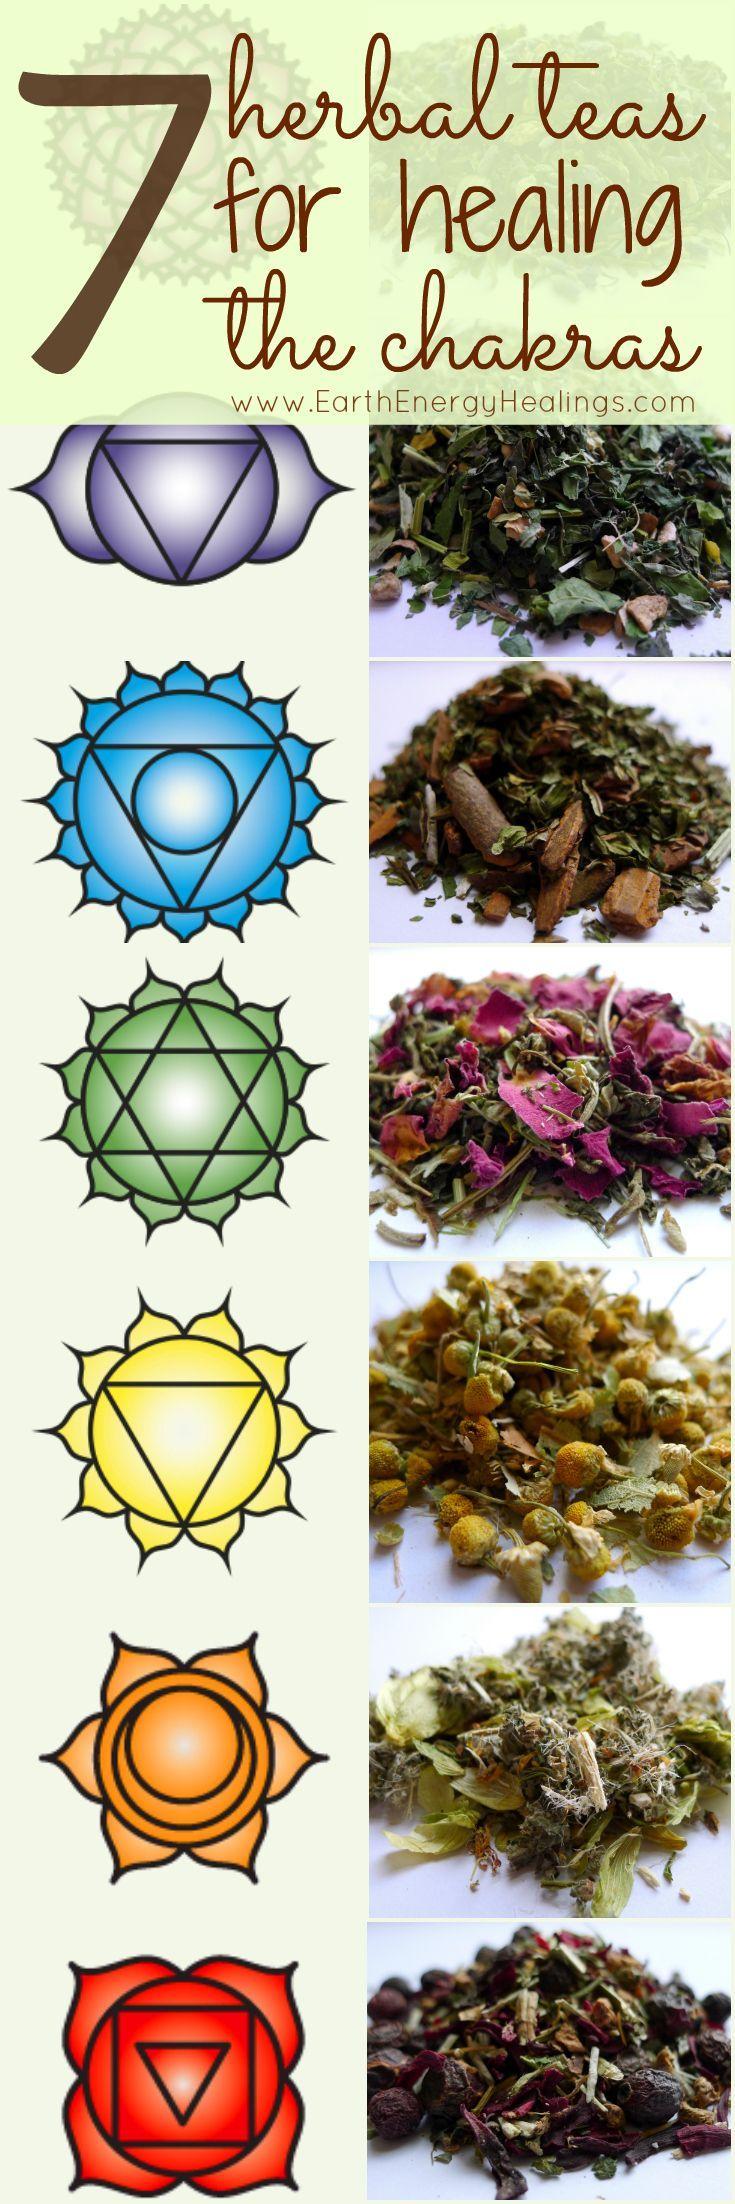 7 Herbal Chakra Healing Teas by Earth Energy Healings. Beautiful!